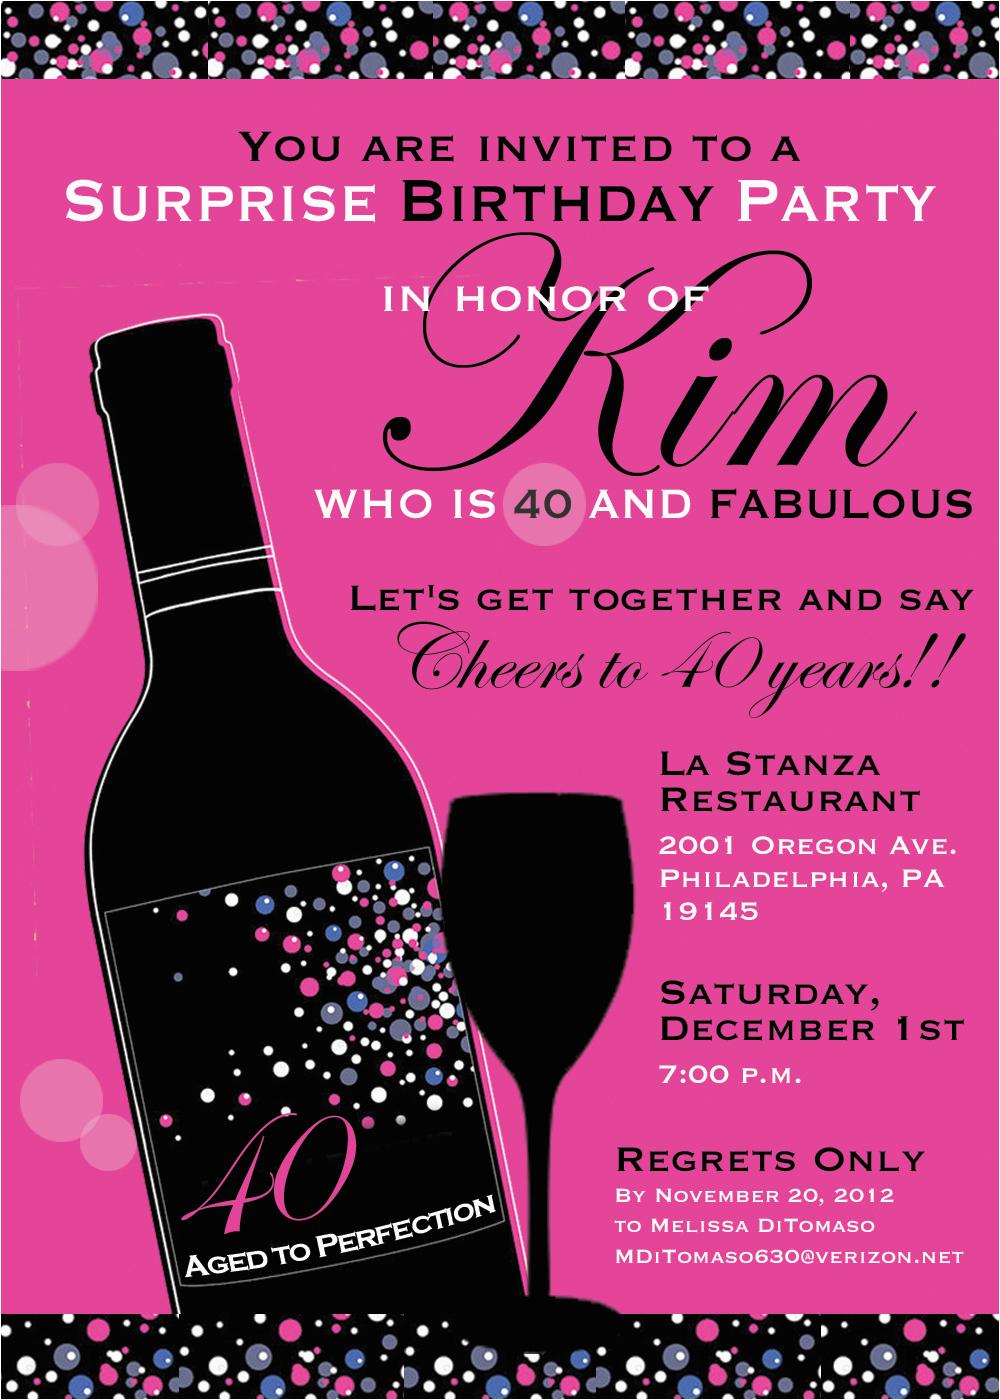 40th Birthday Invitation Sayings 8 Invitations Ideas And Themes Sample